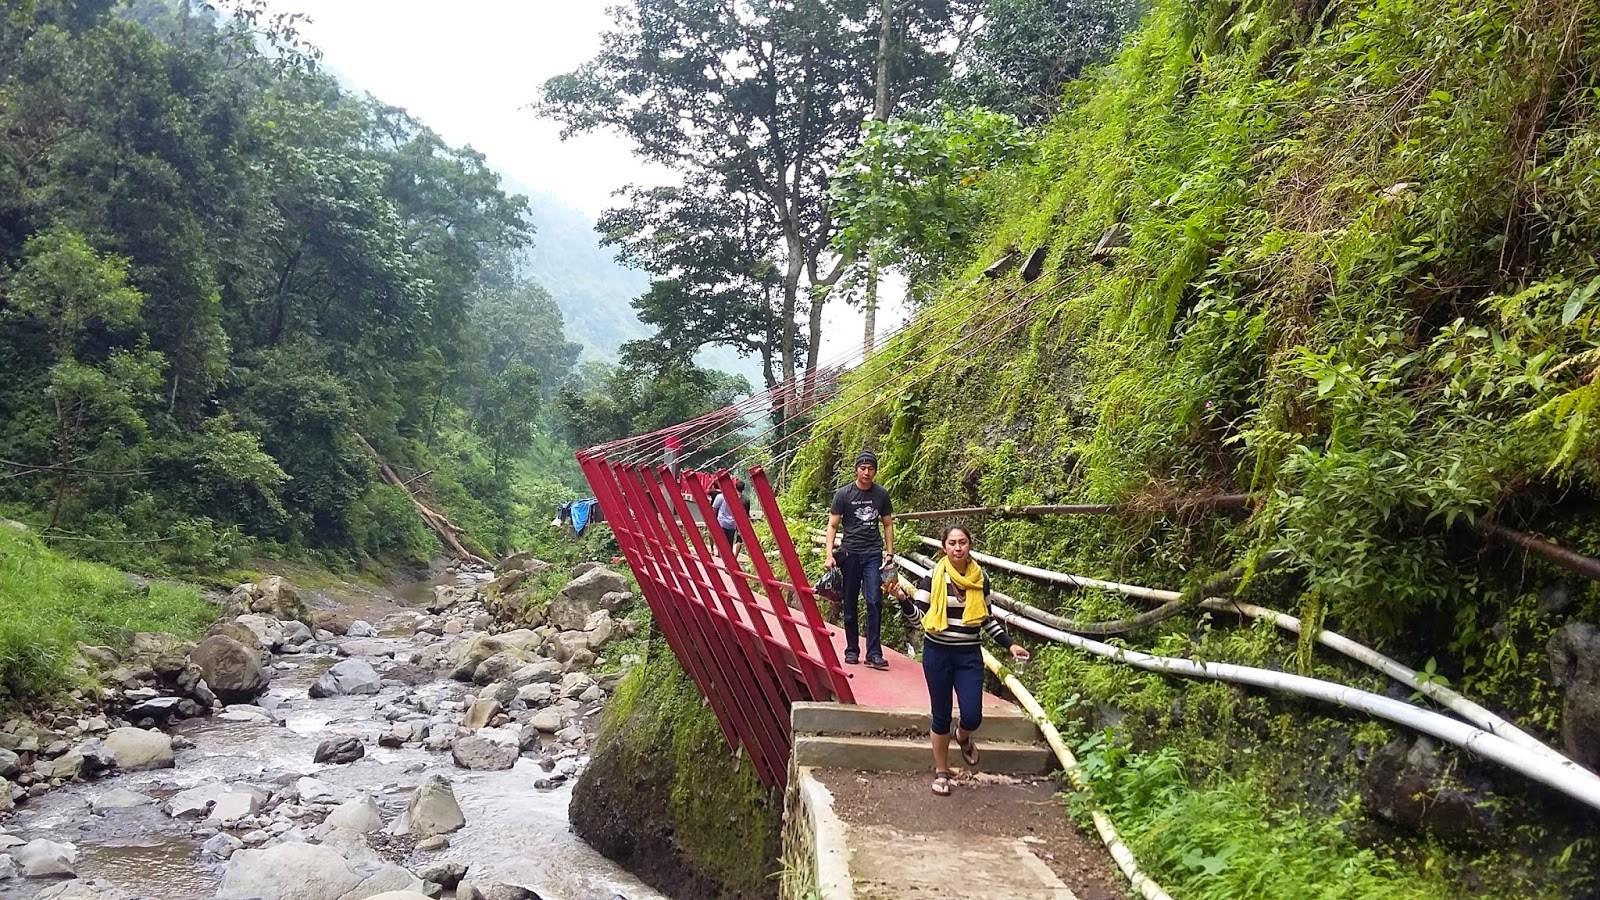 Kampung Enam Wajak Malang Wisata Rumah Pohon Hits Lokasi Air